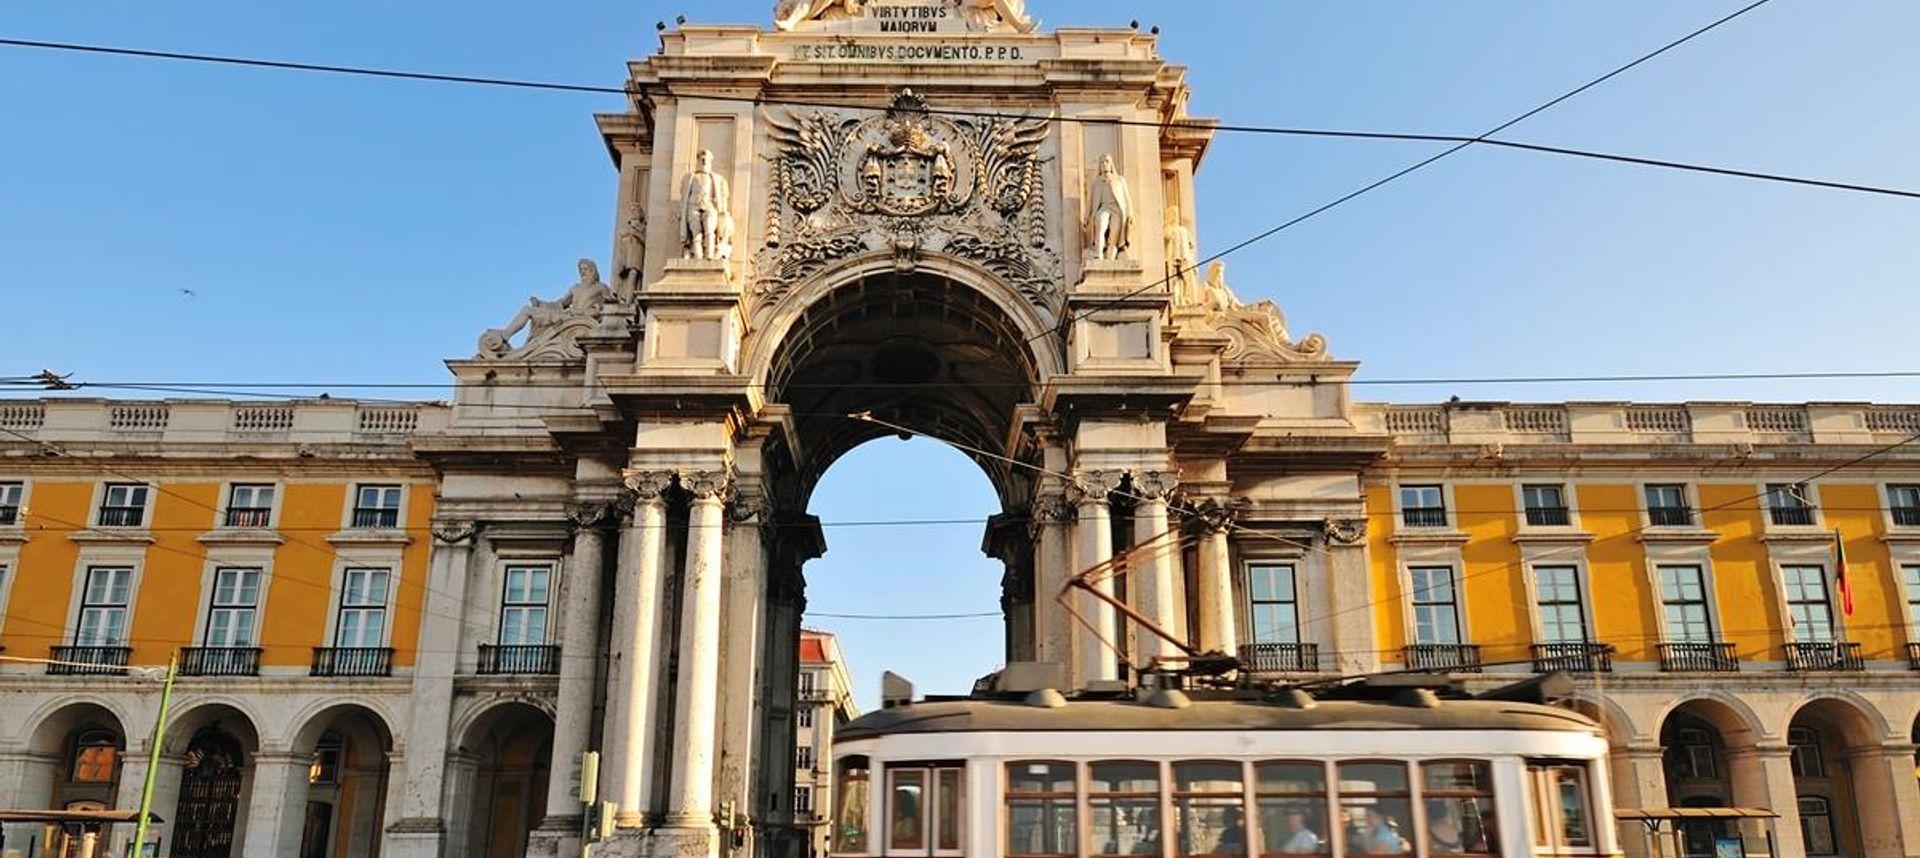 Torre de Bele?m, Lisbon (Photo: iStock)